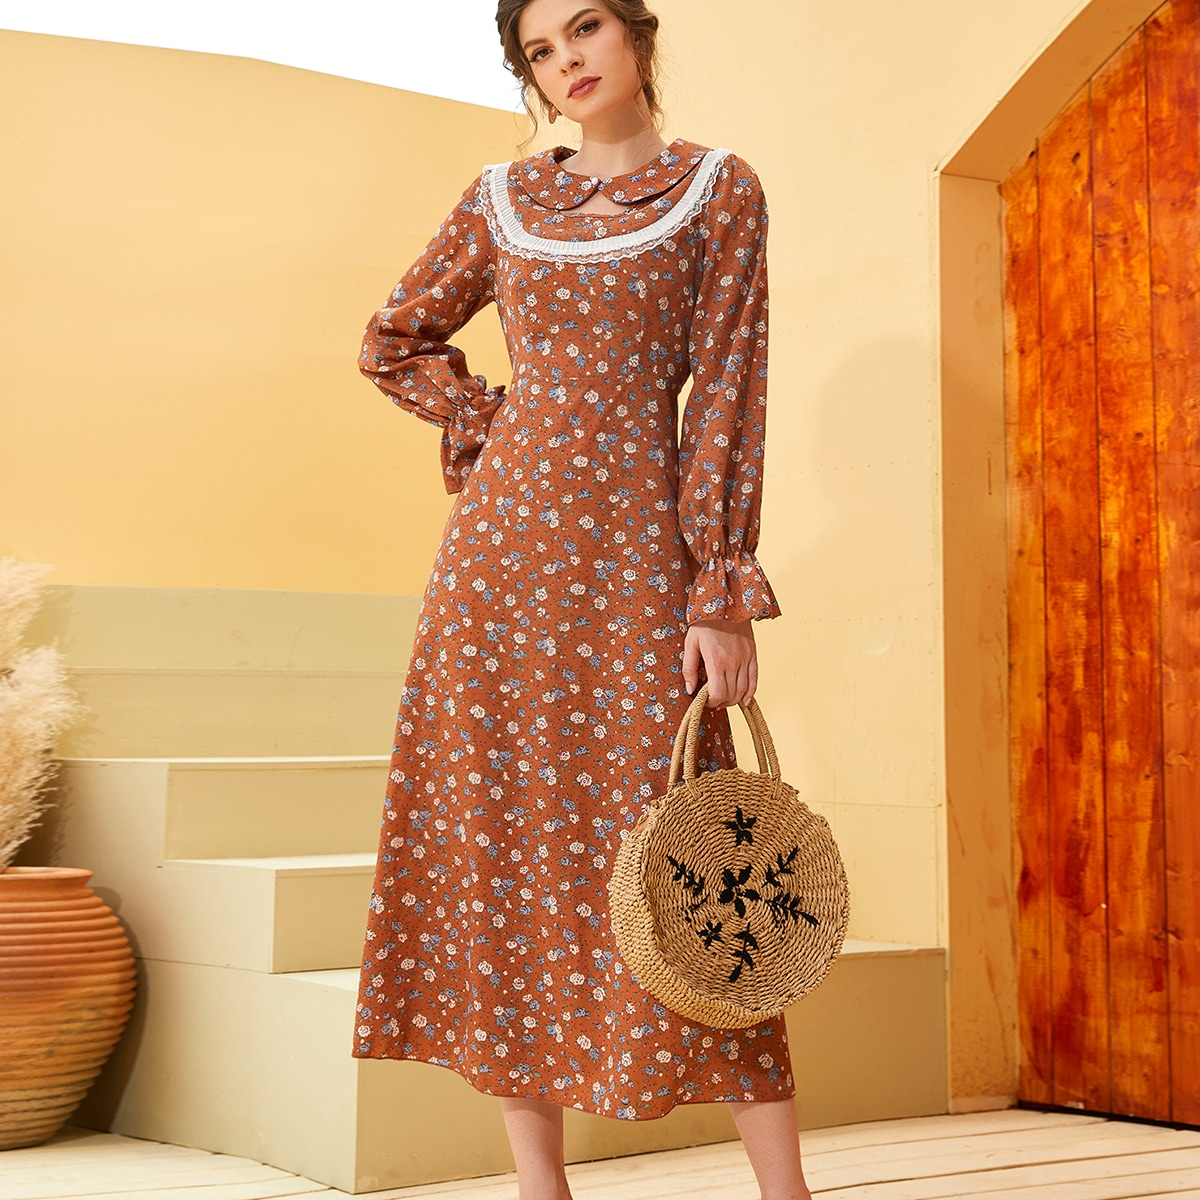 Peter Pan Collar Ditsy Floral Lace Trim Dress